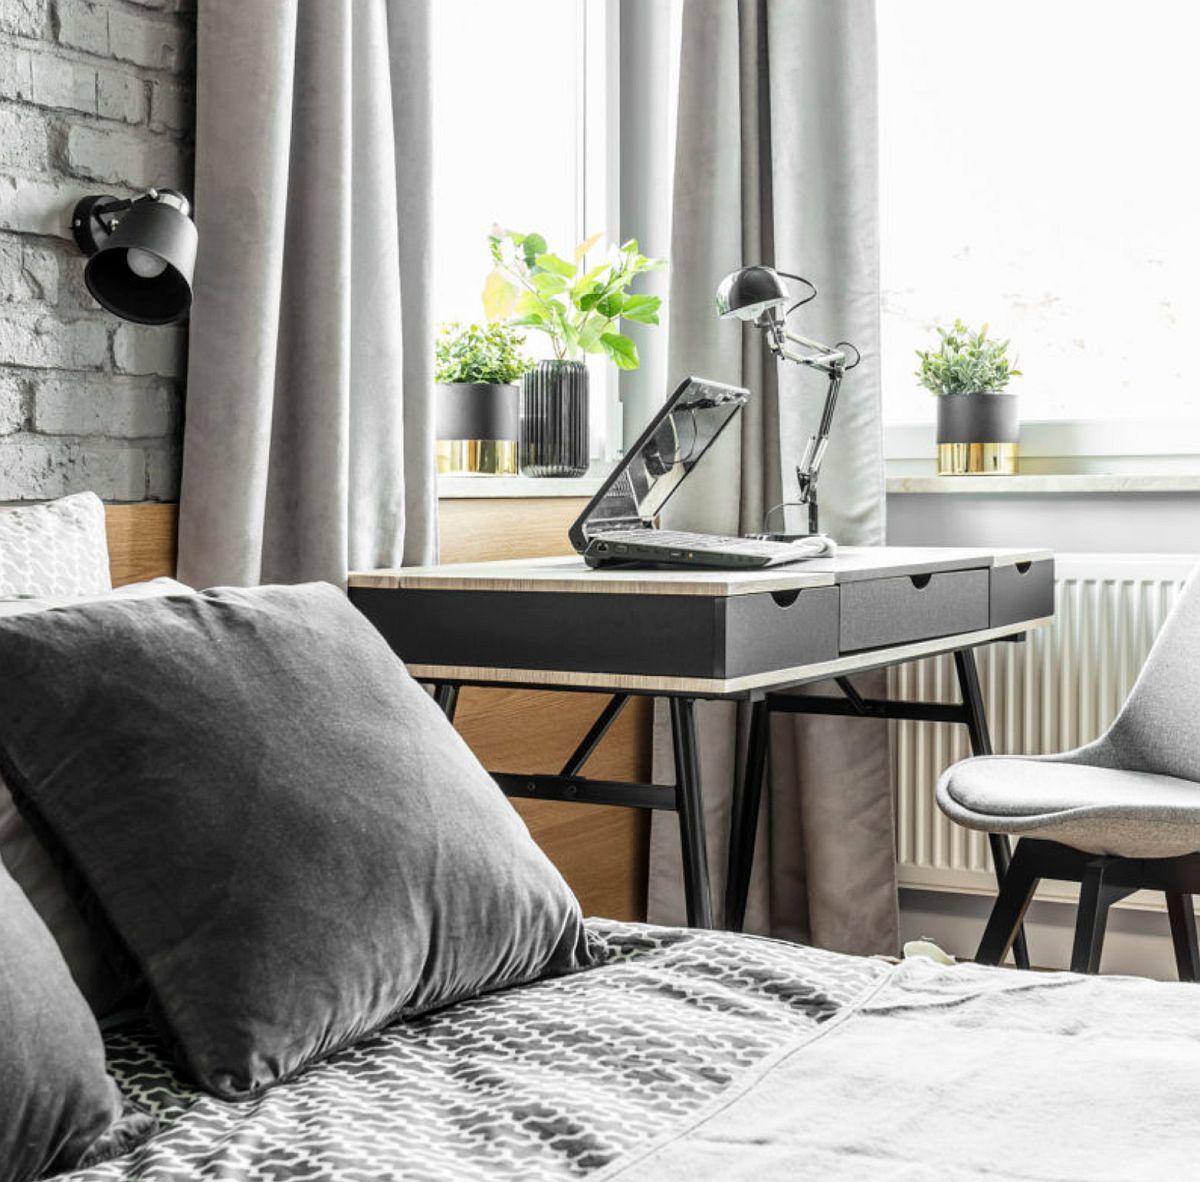 adelaparvu.com despre apartament 56 mp cu accente de rosu, design SAS Wnetrza i Kuchnie, Foto Strazynski Studio (16)